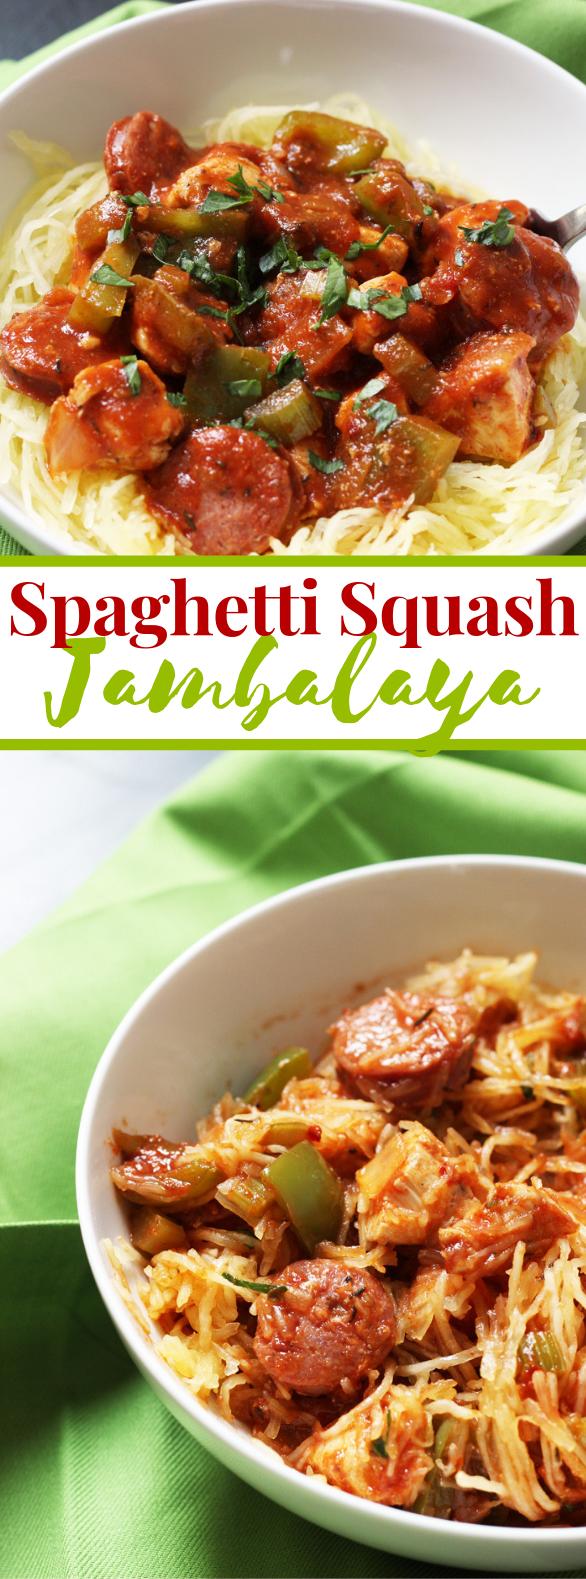 Spaghetti Squash Jambalaya #lowcarb #paleo